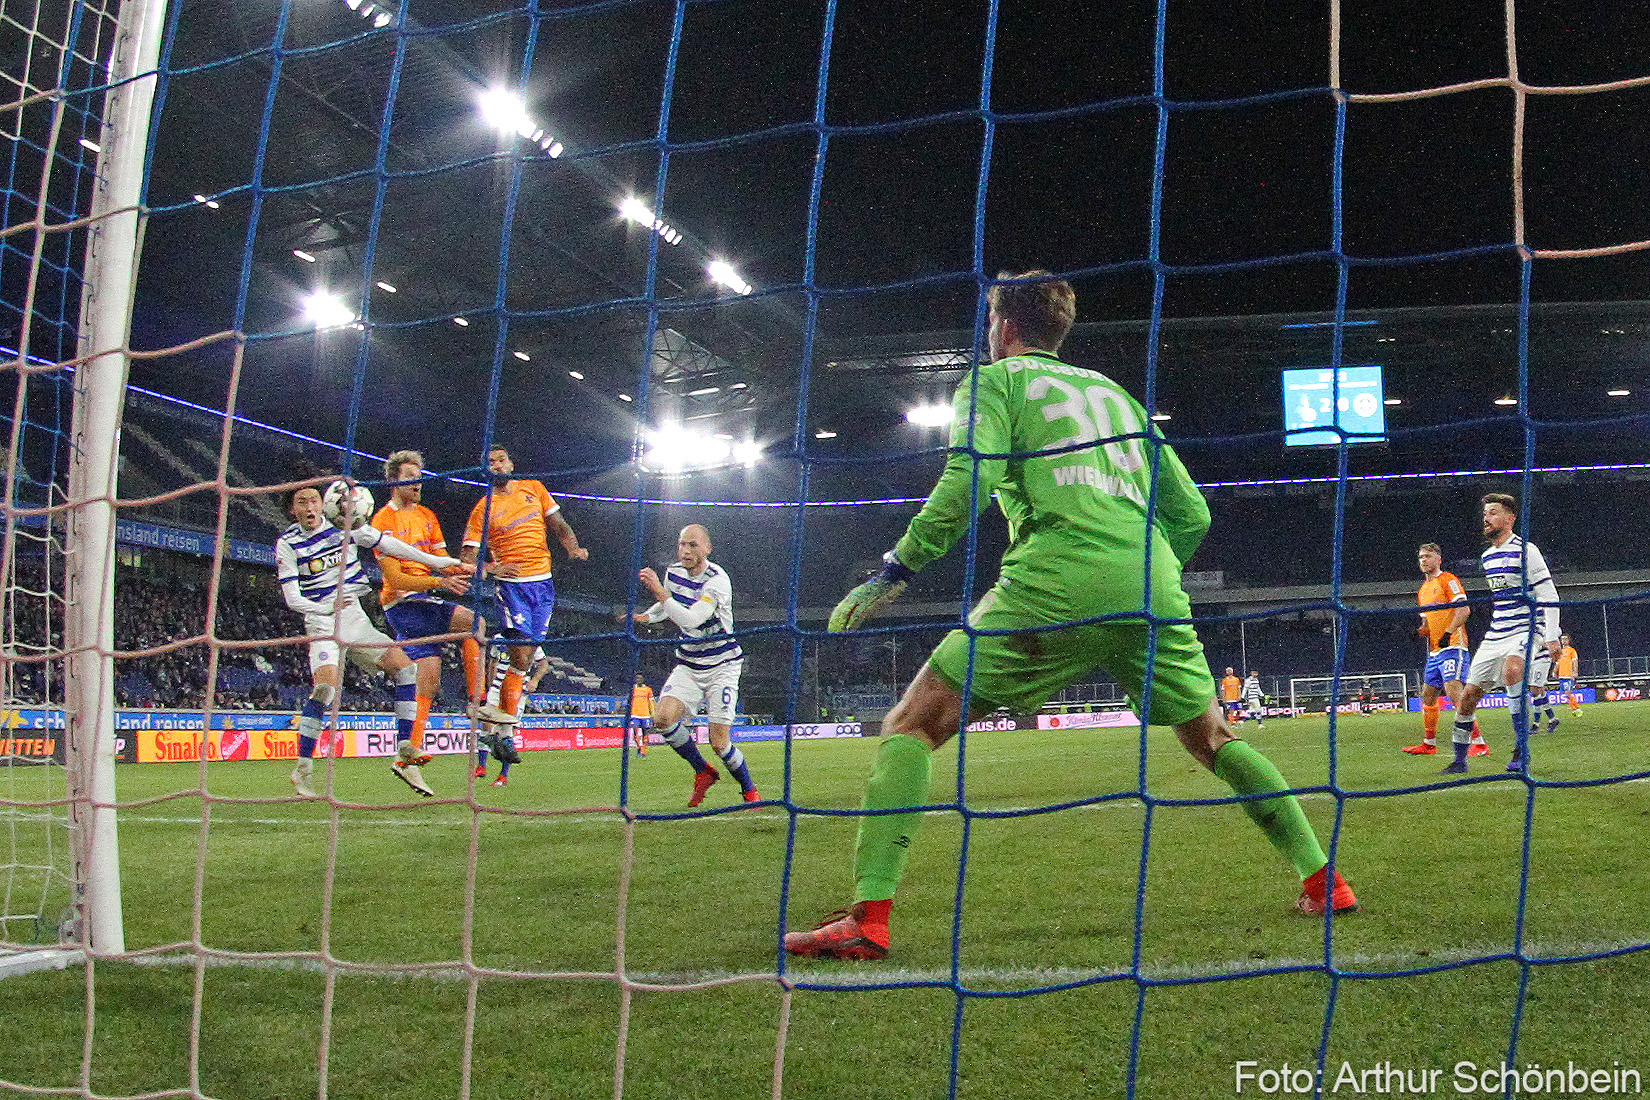 MSV Duisburg – SV Darmstadt 98 3:2 (2:0)